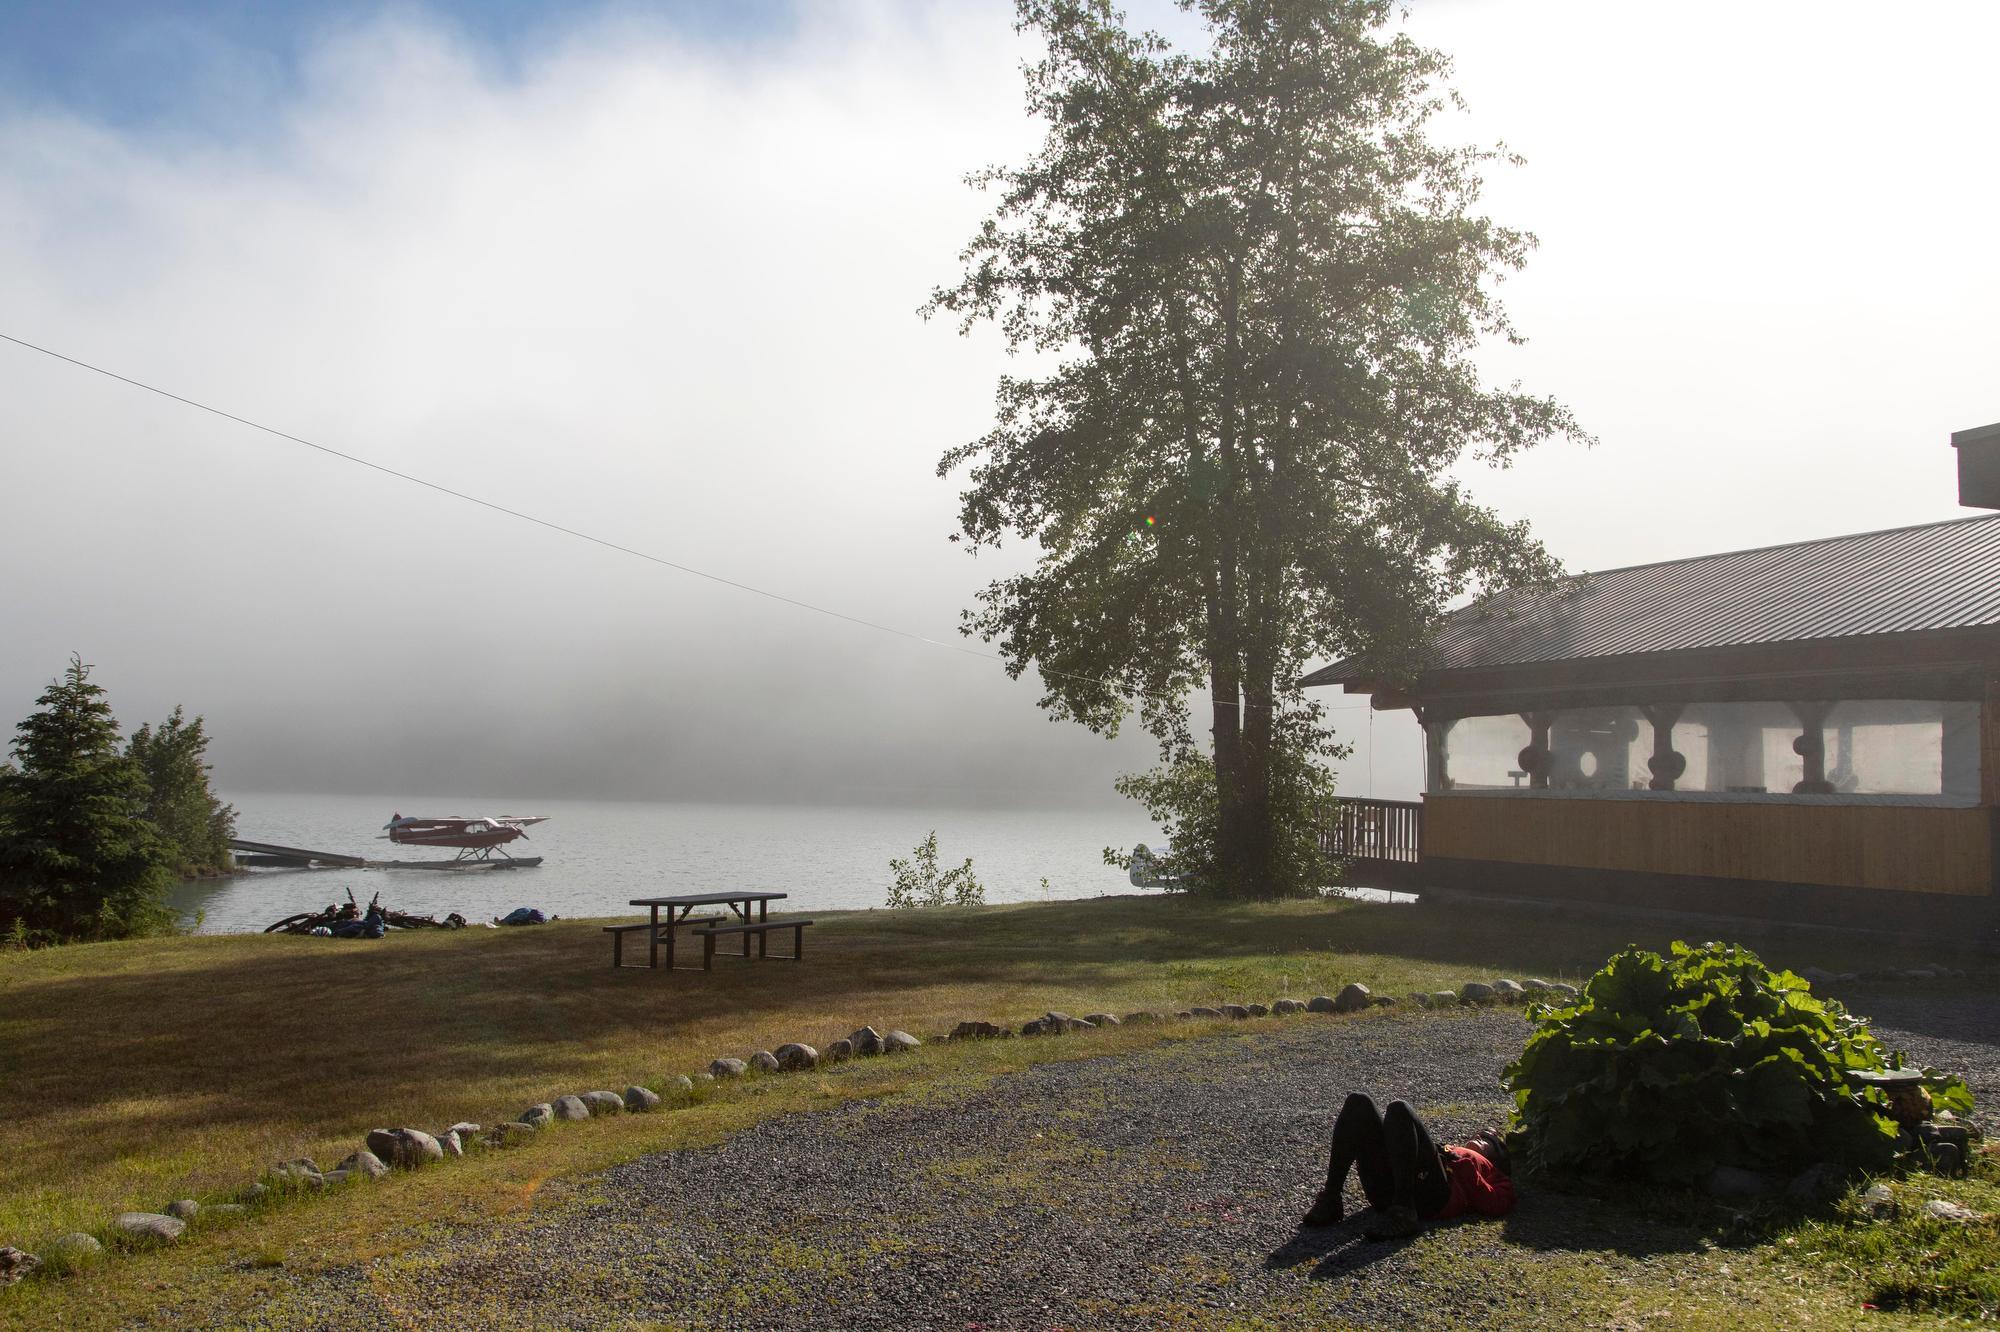 2020 Alaska — The Radavist Kenai 250 Race 041